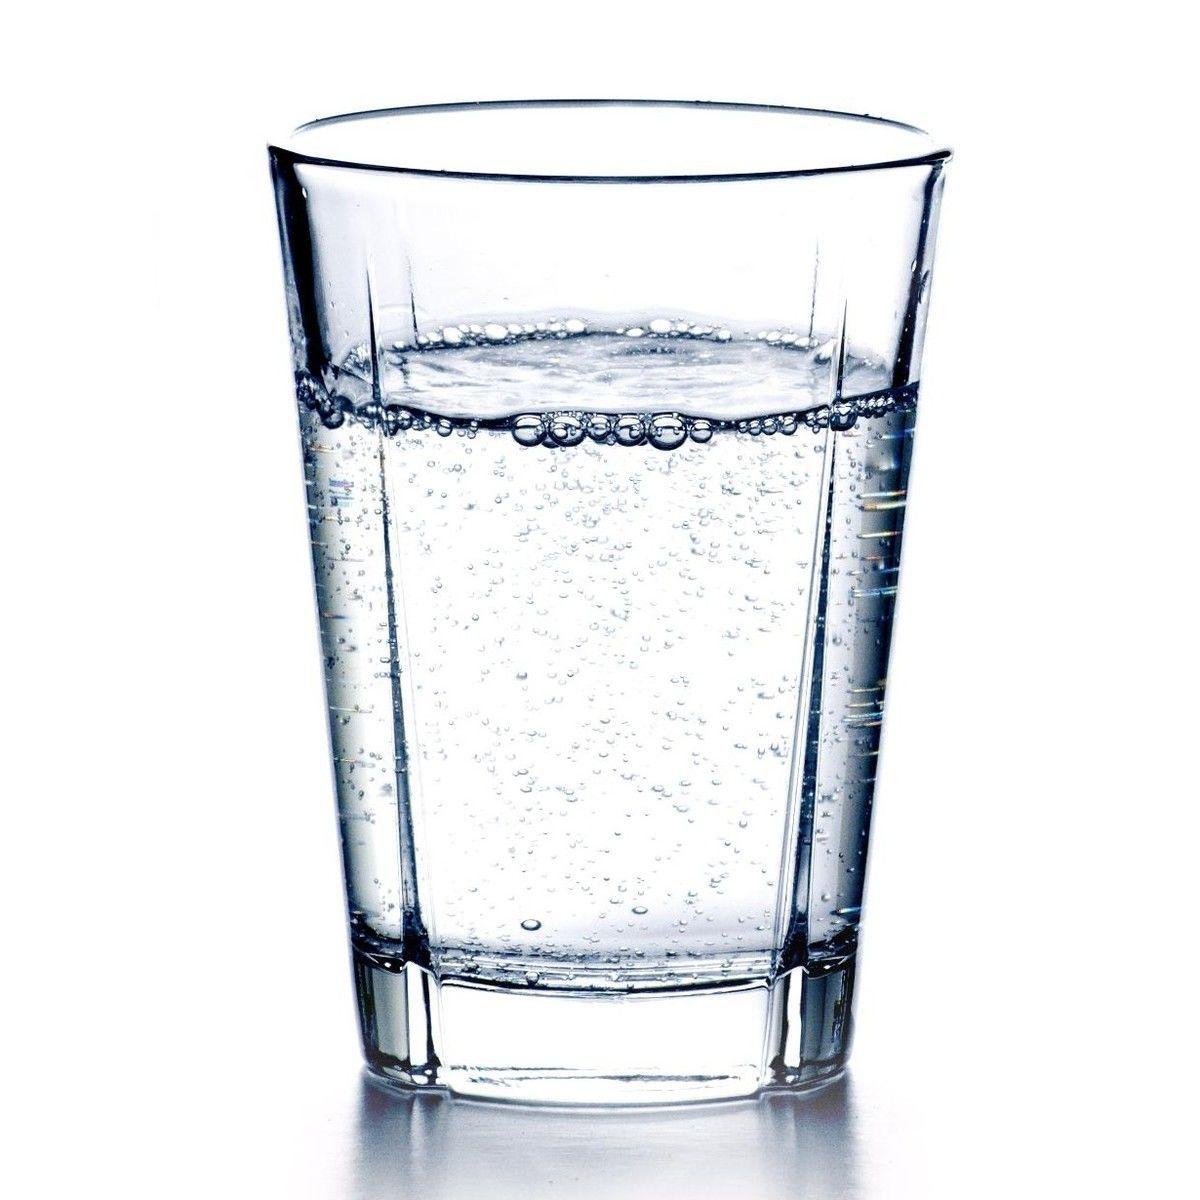 Grand cru lot de 6 verres eau rosendahl design group - Verres a eau design ...